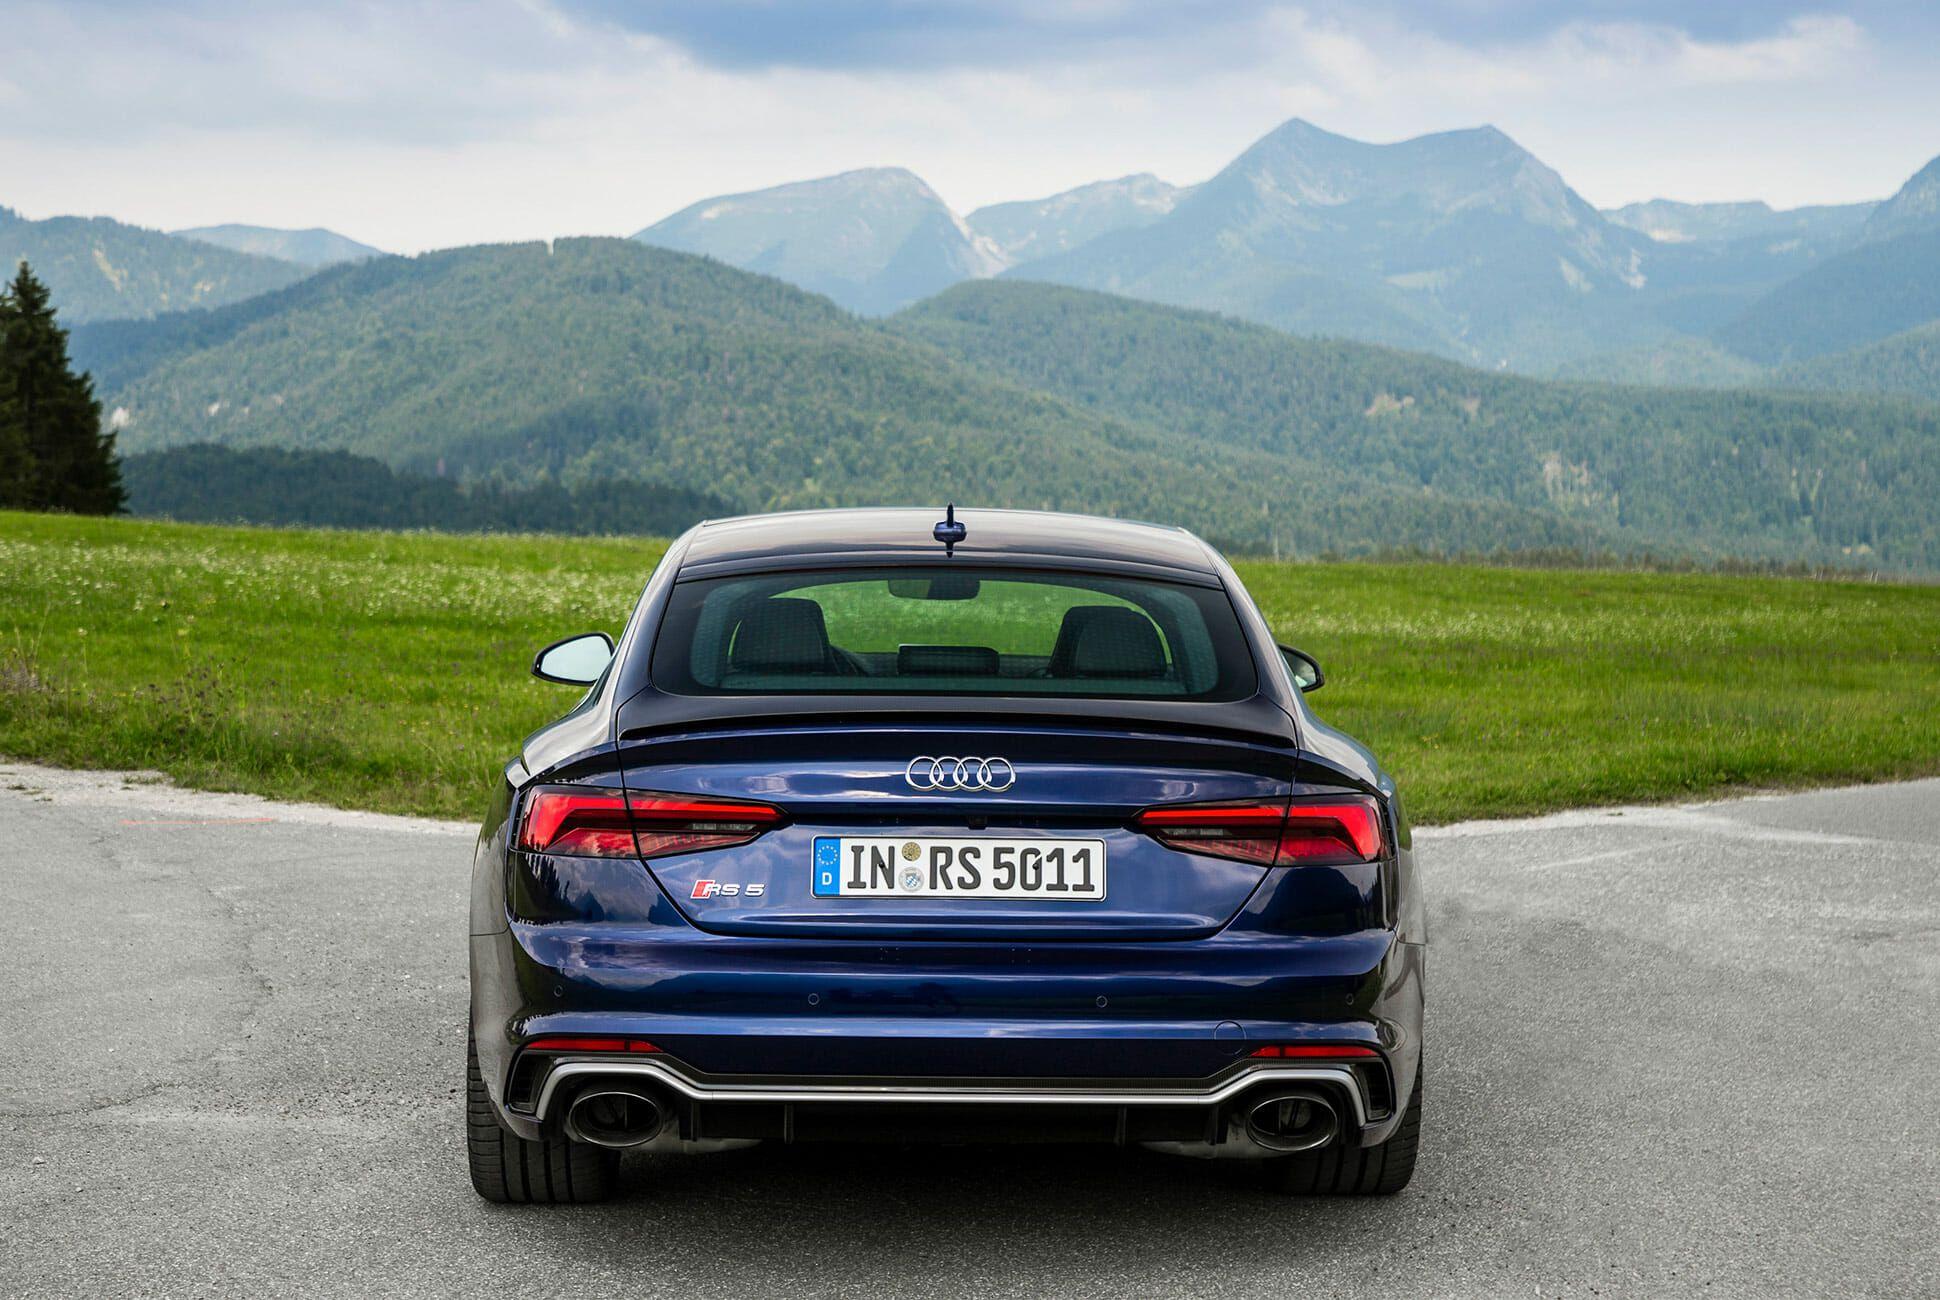 Audi-RS5-Sportback-Review-gear-patrol-slide-3